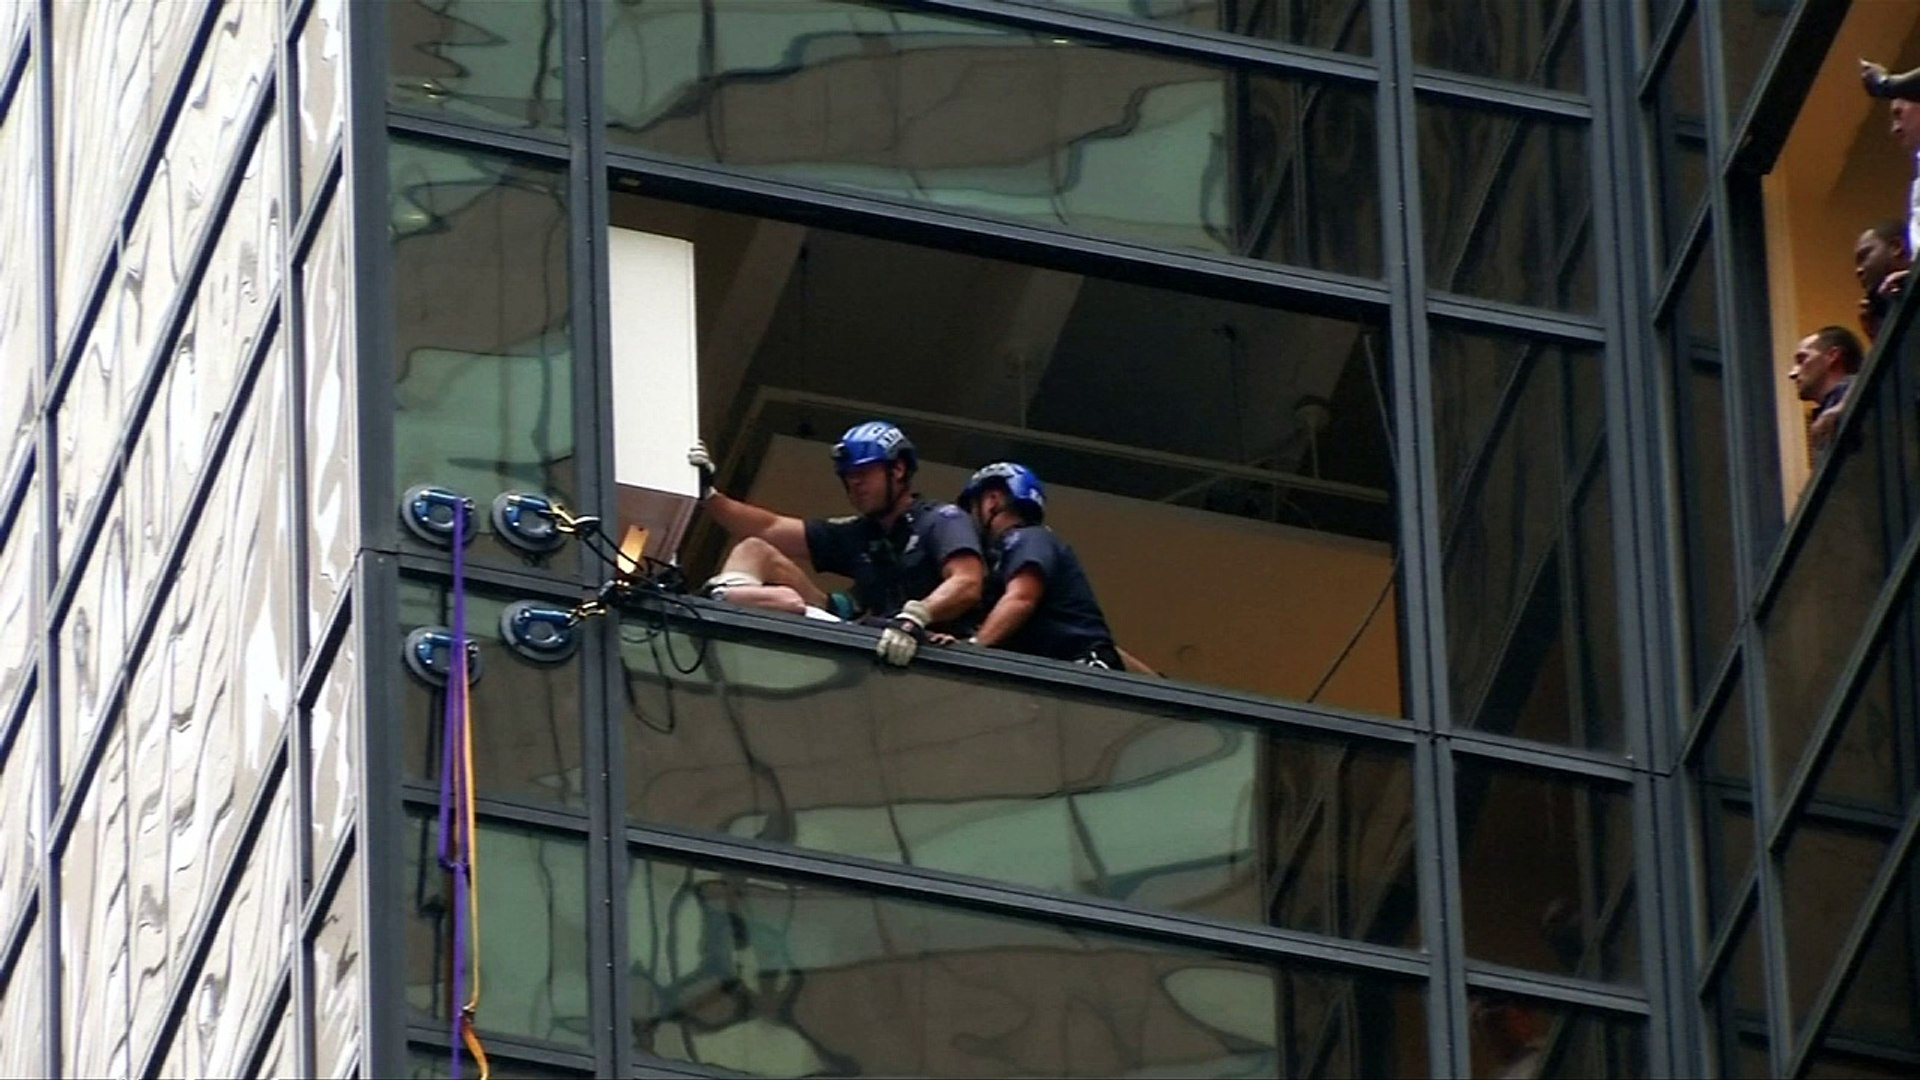 Man scales Trump Tower to meet Donald Trump